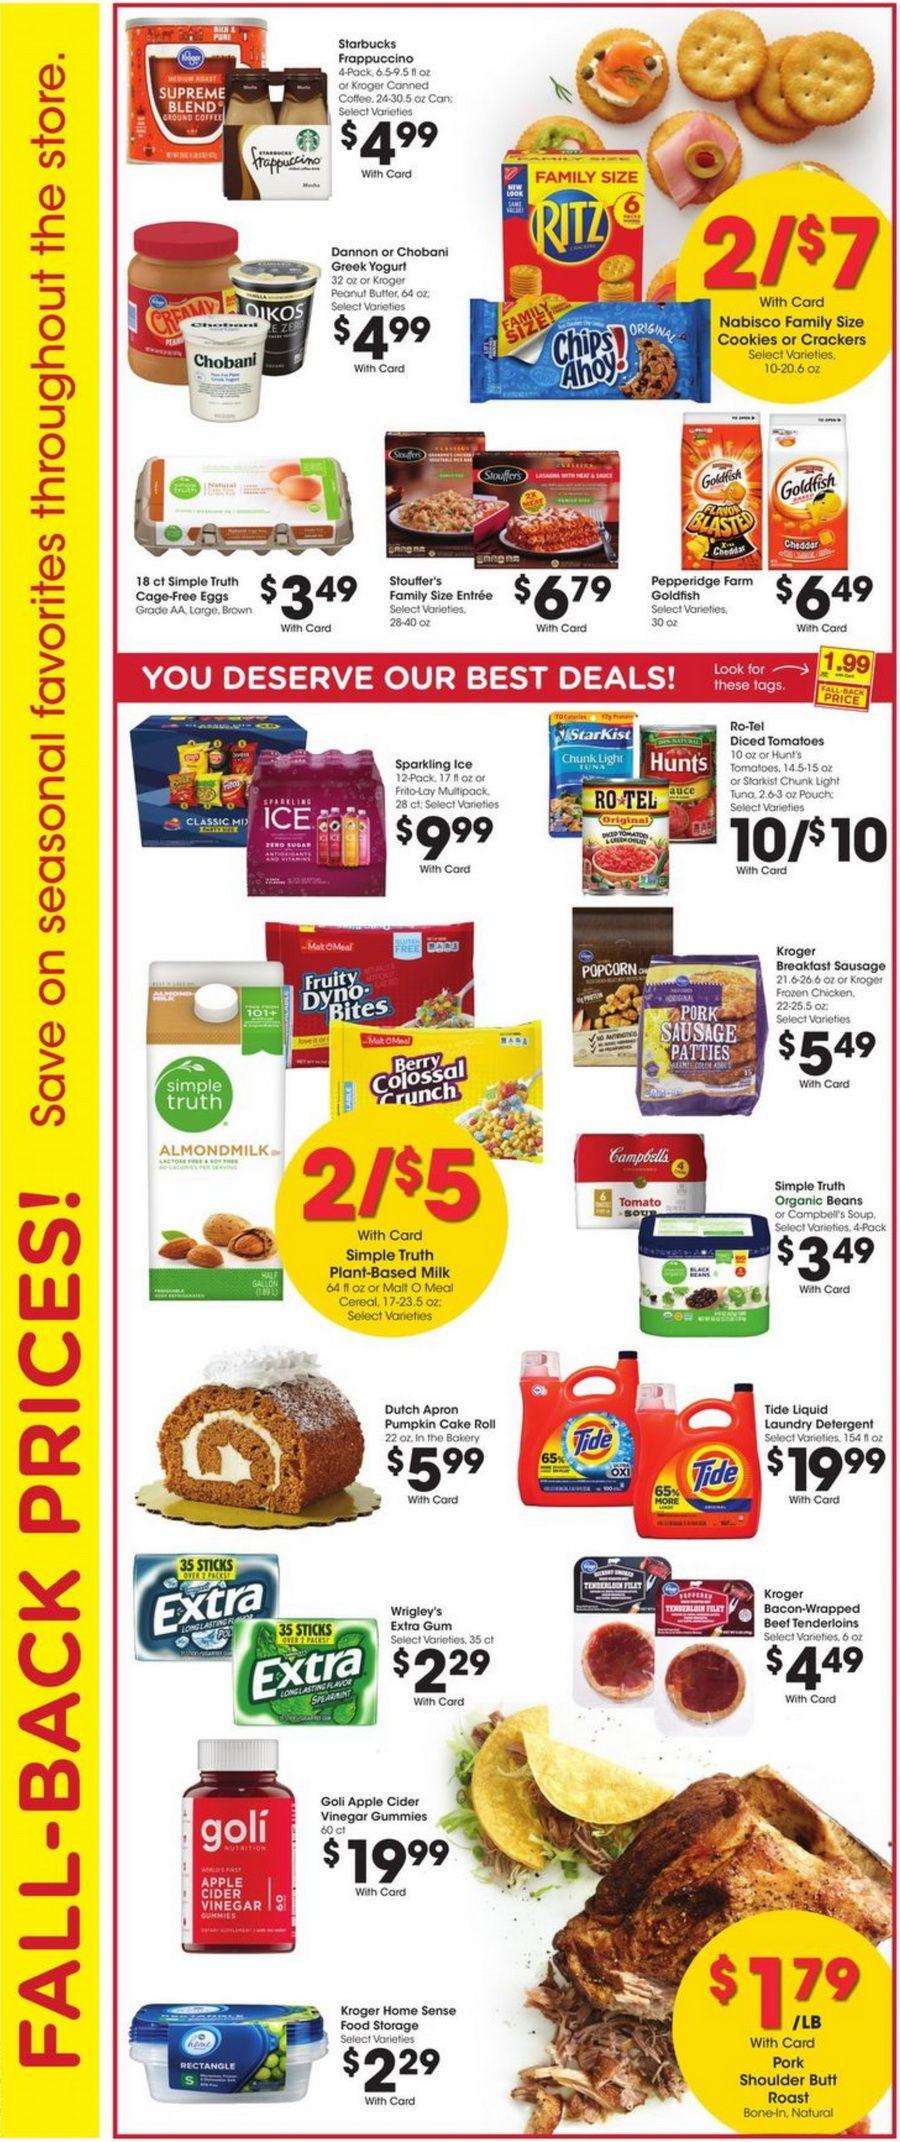 Smith's Food and Drug Weekly Circular Sep 23 - Sep 29, 2020